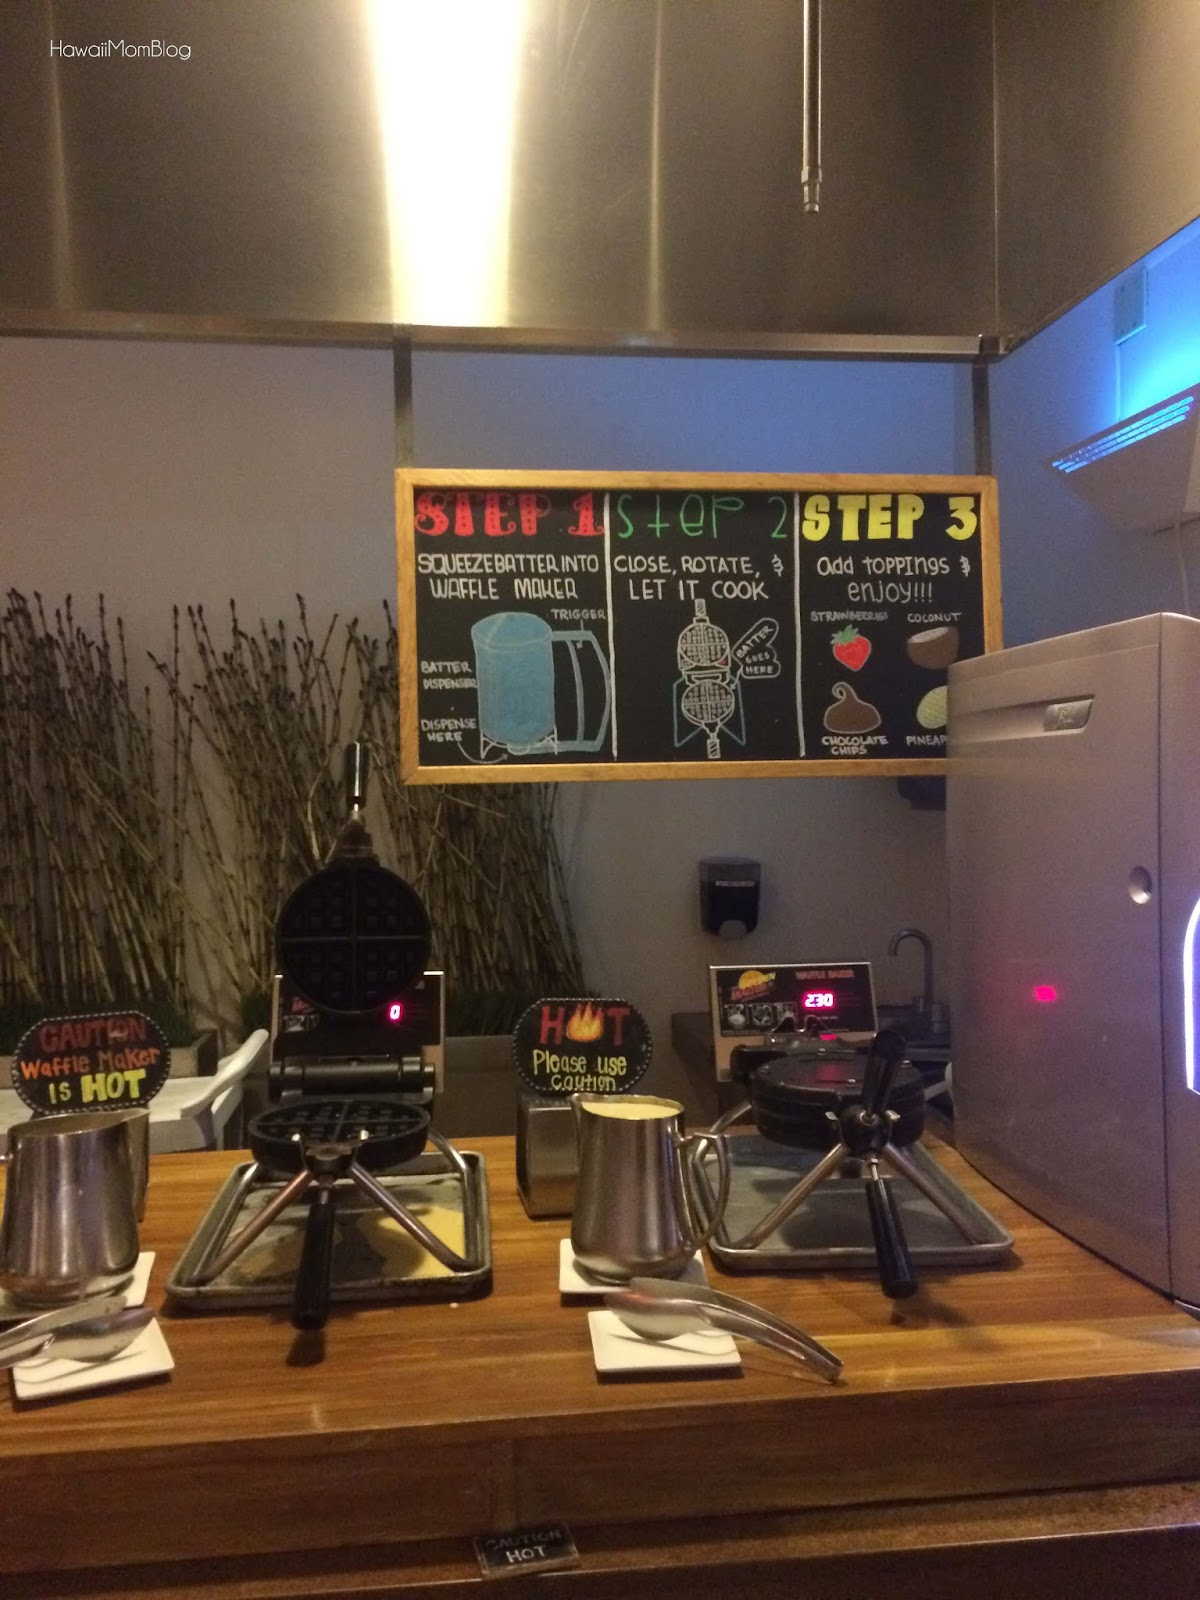 Hawaii Mom Blog Visit Maui Black Rock Kitchen Breakfast Buffet